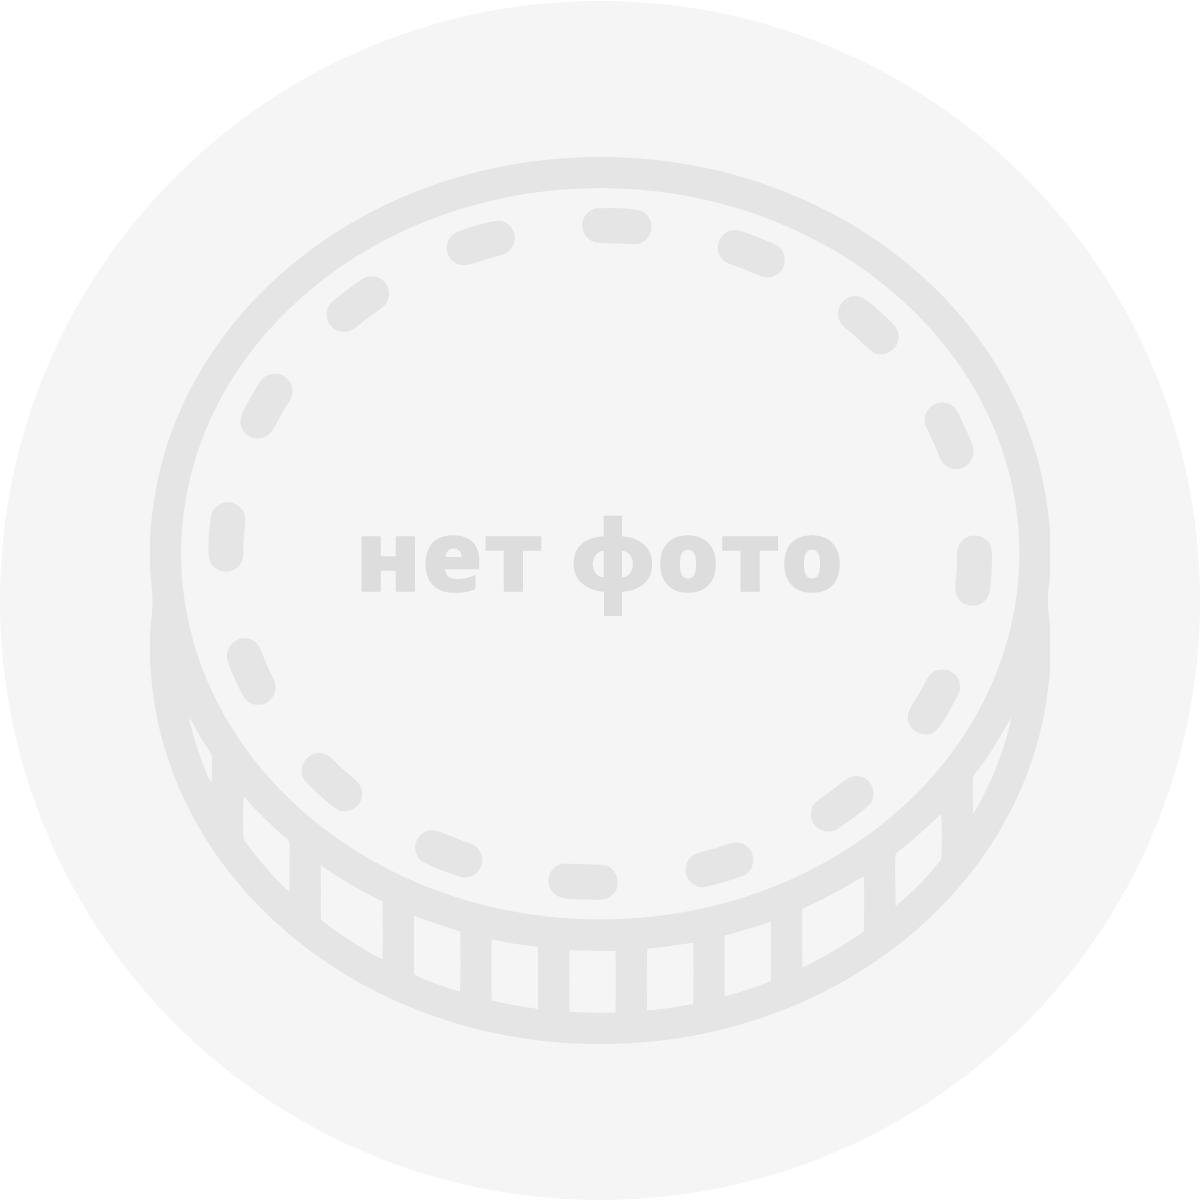 Спратли, 100 юаней (2018 г.)